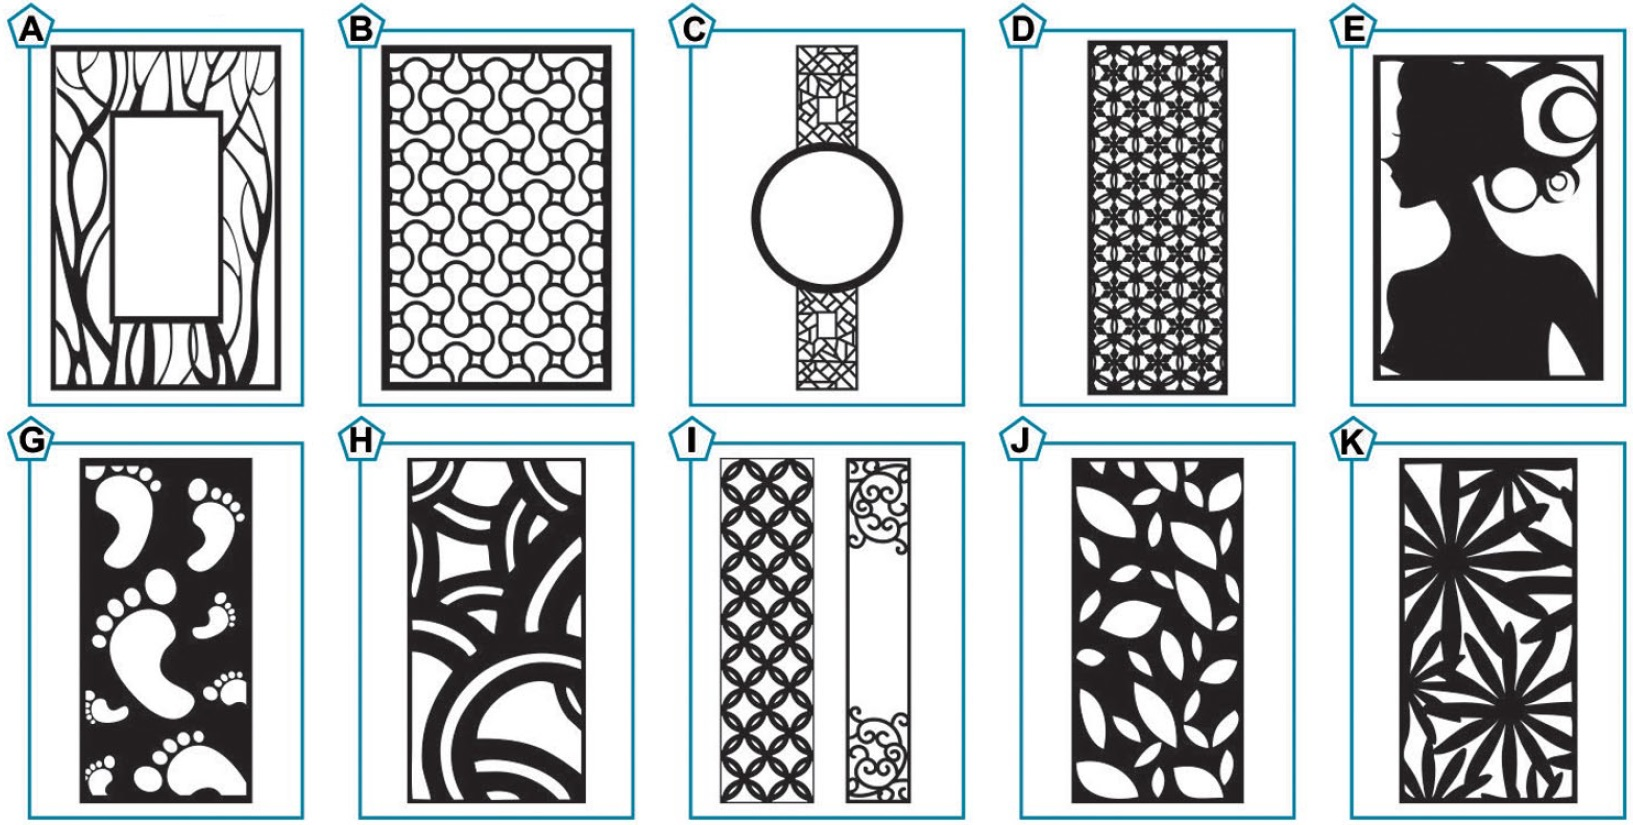 Cnc Designs जालि डिजाइनहरू For Room Partitions